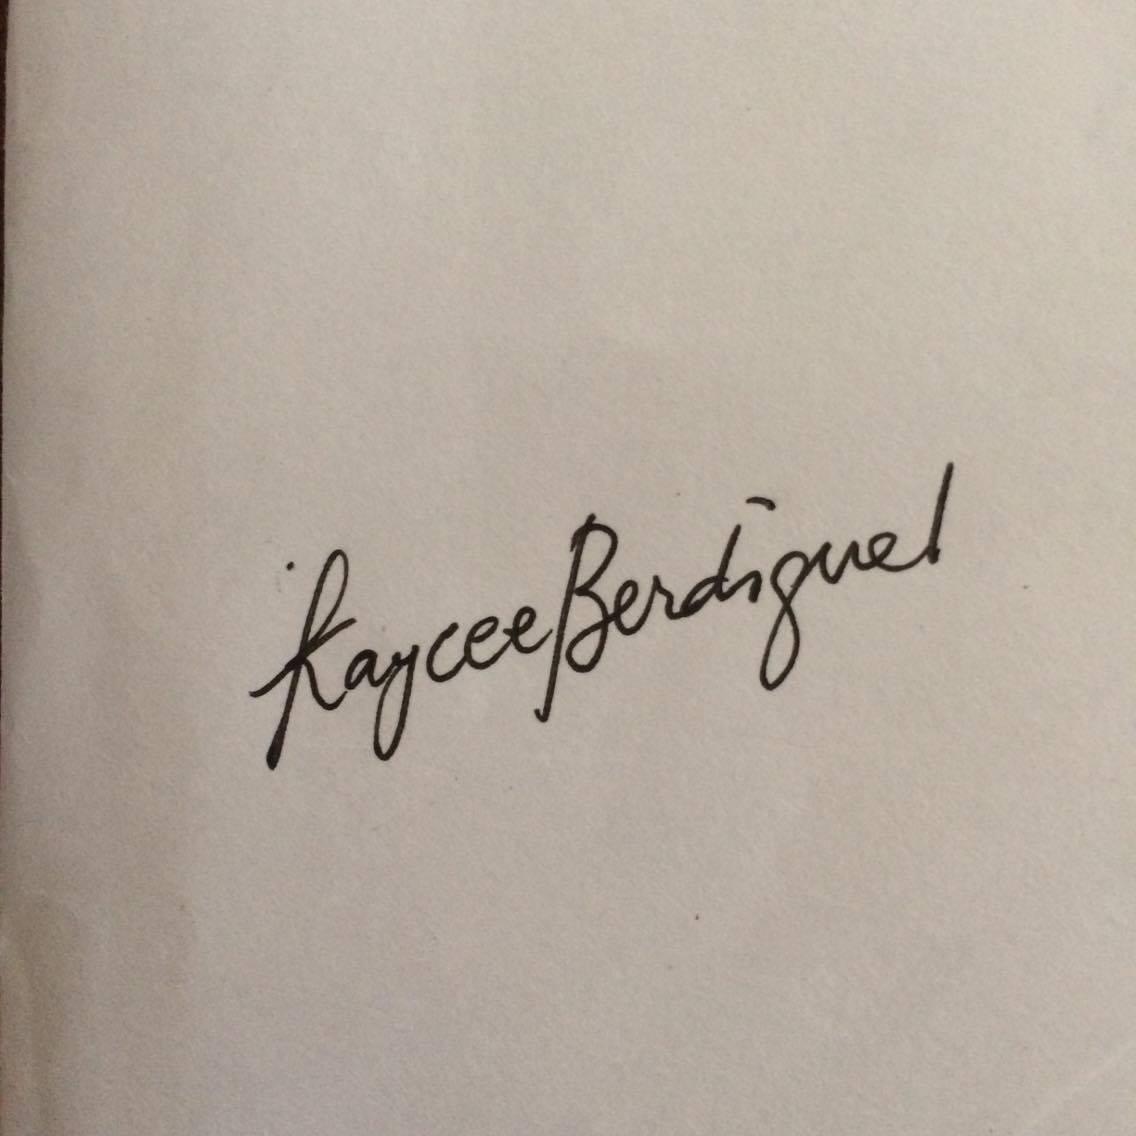 Kaycee Berdiguel's Signature